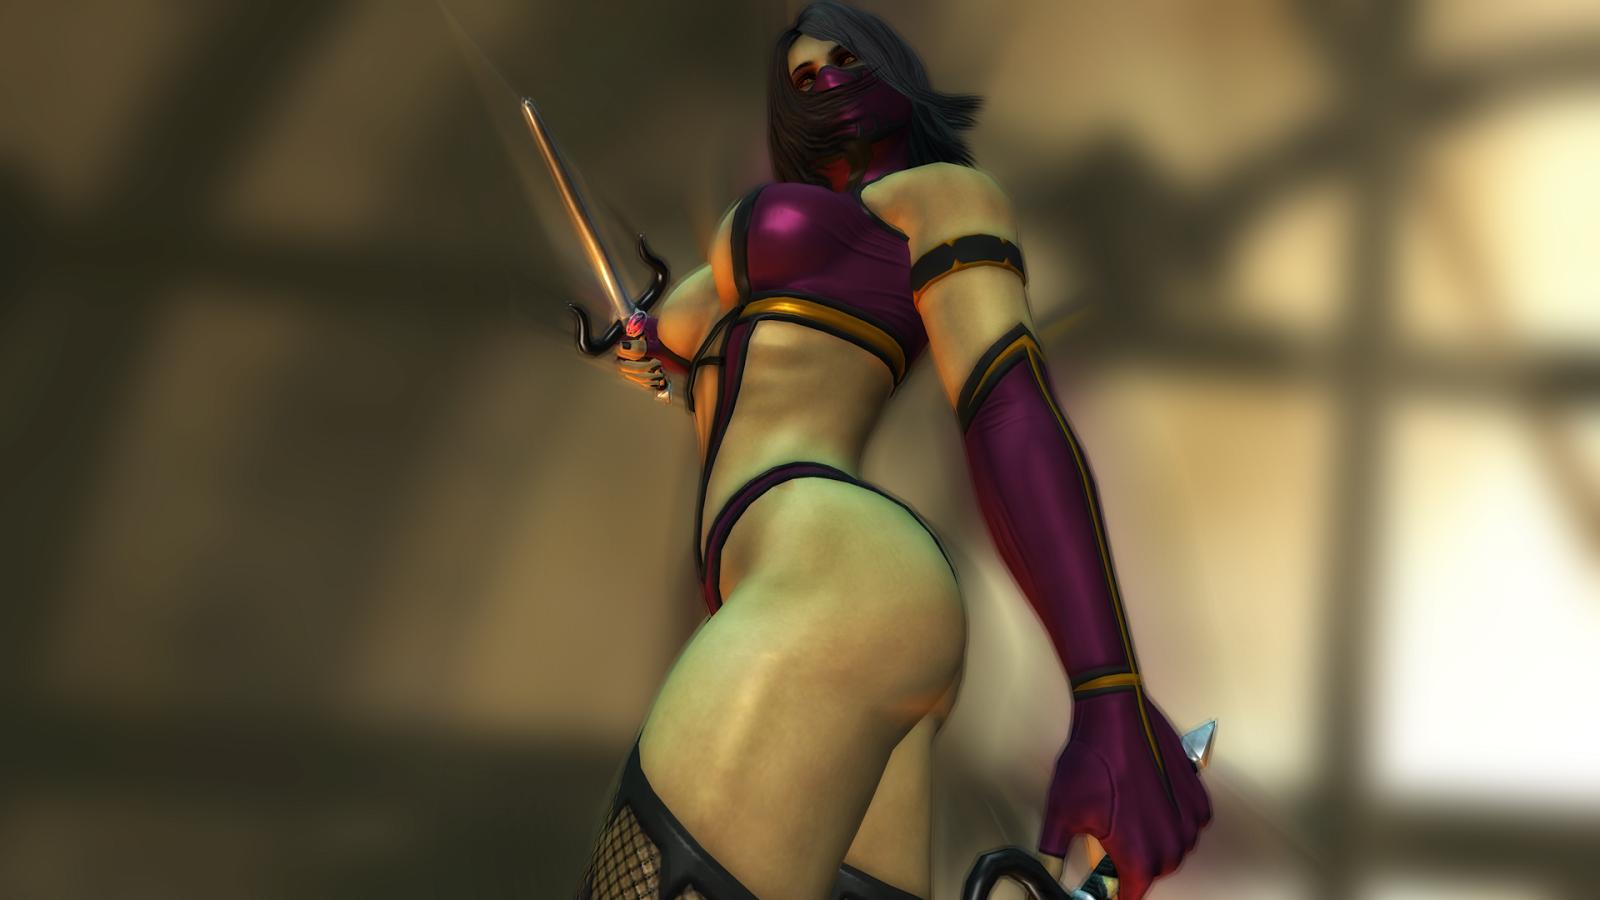 Mortal kombat girls nake mod on ps sexy video